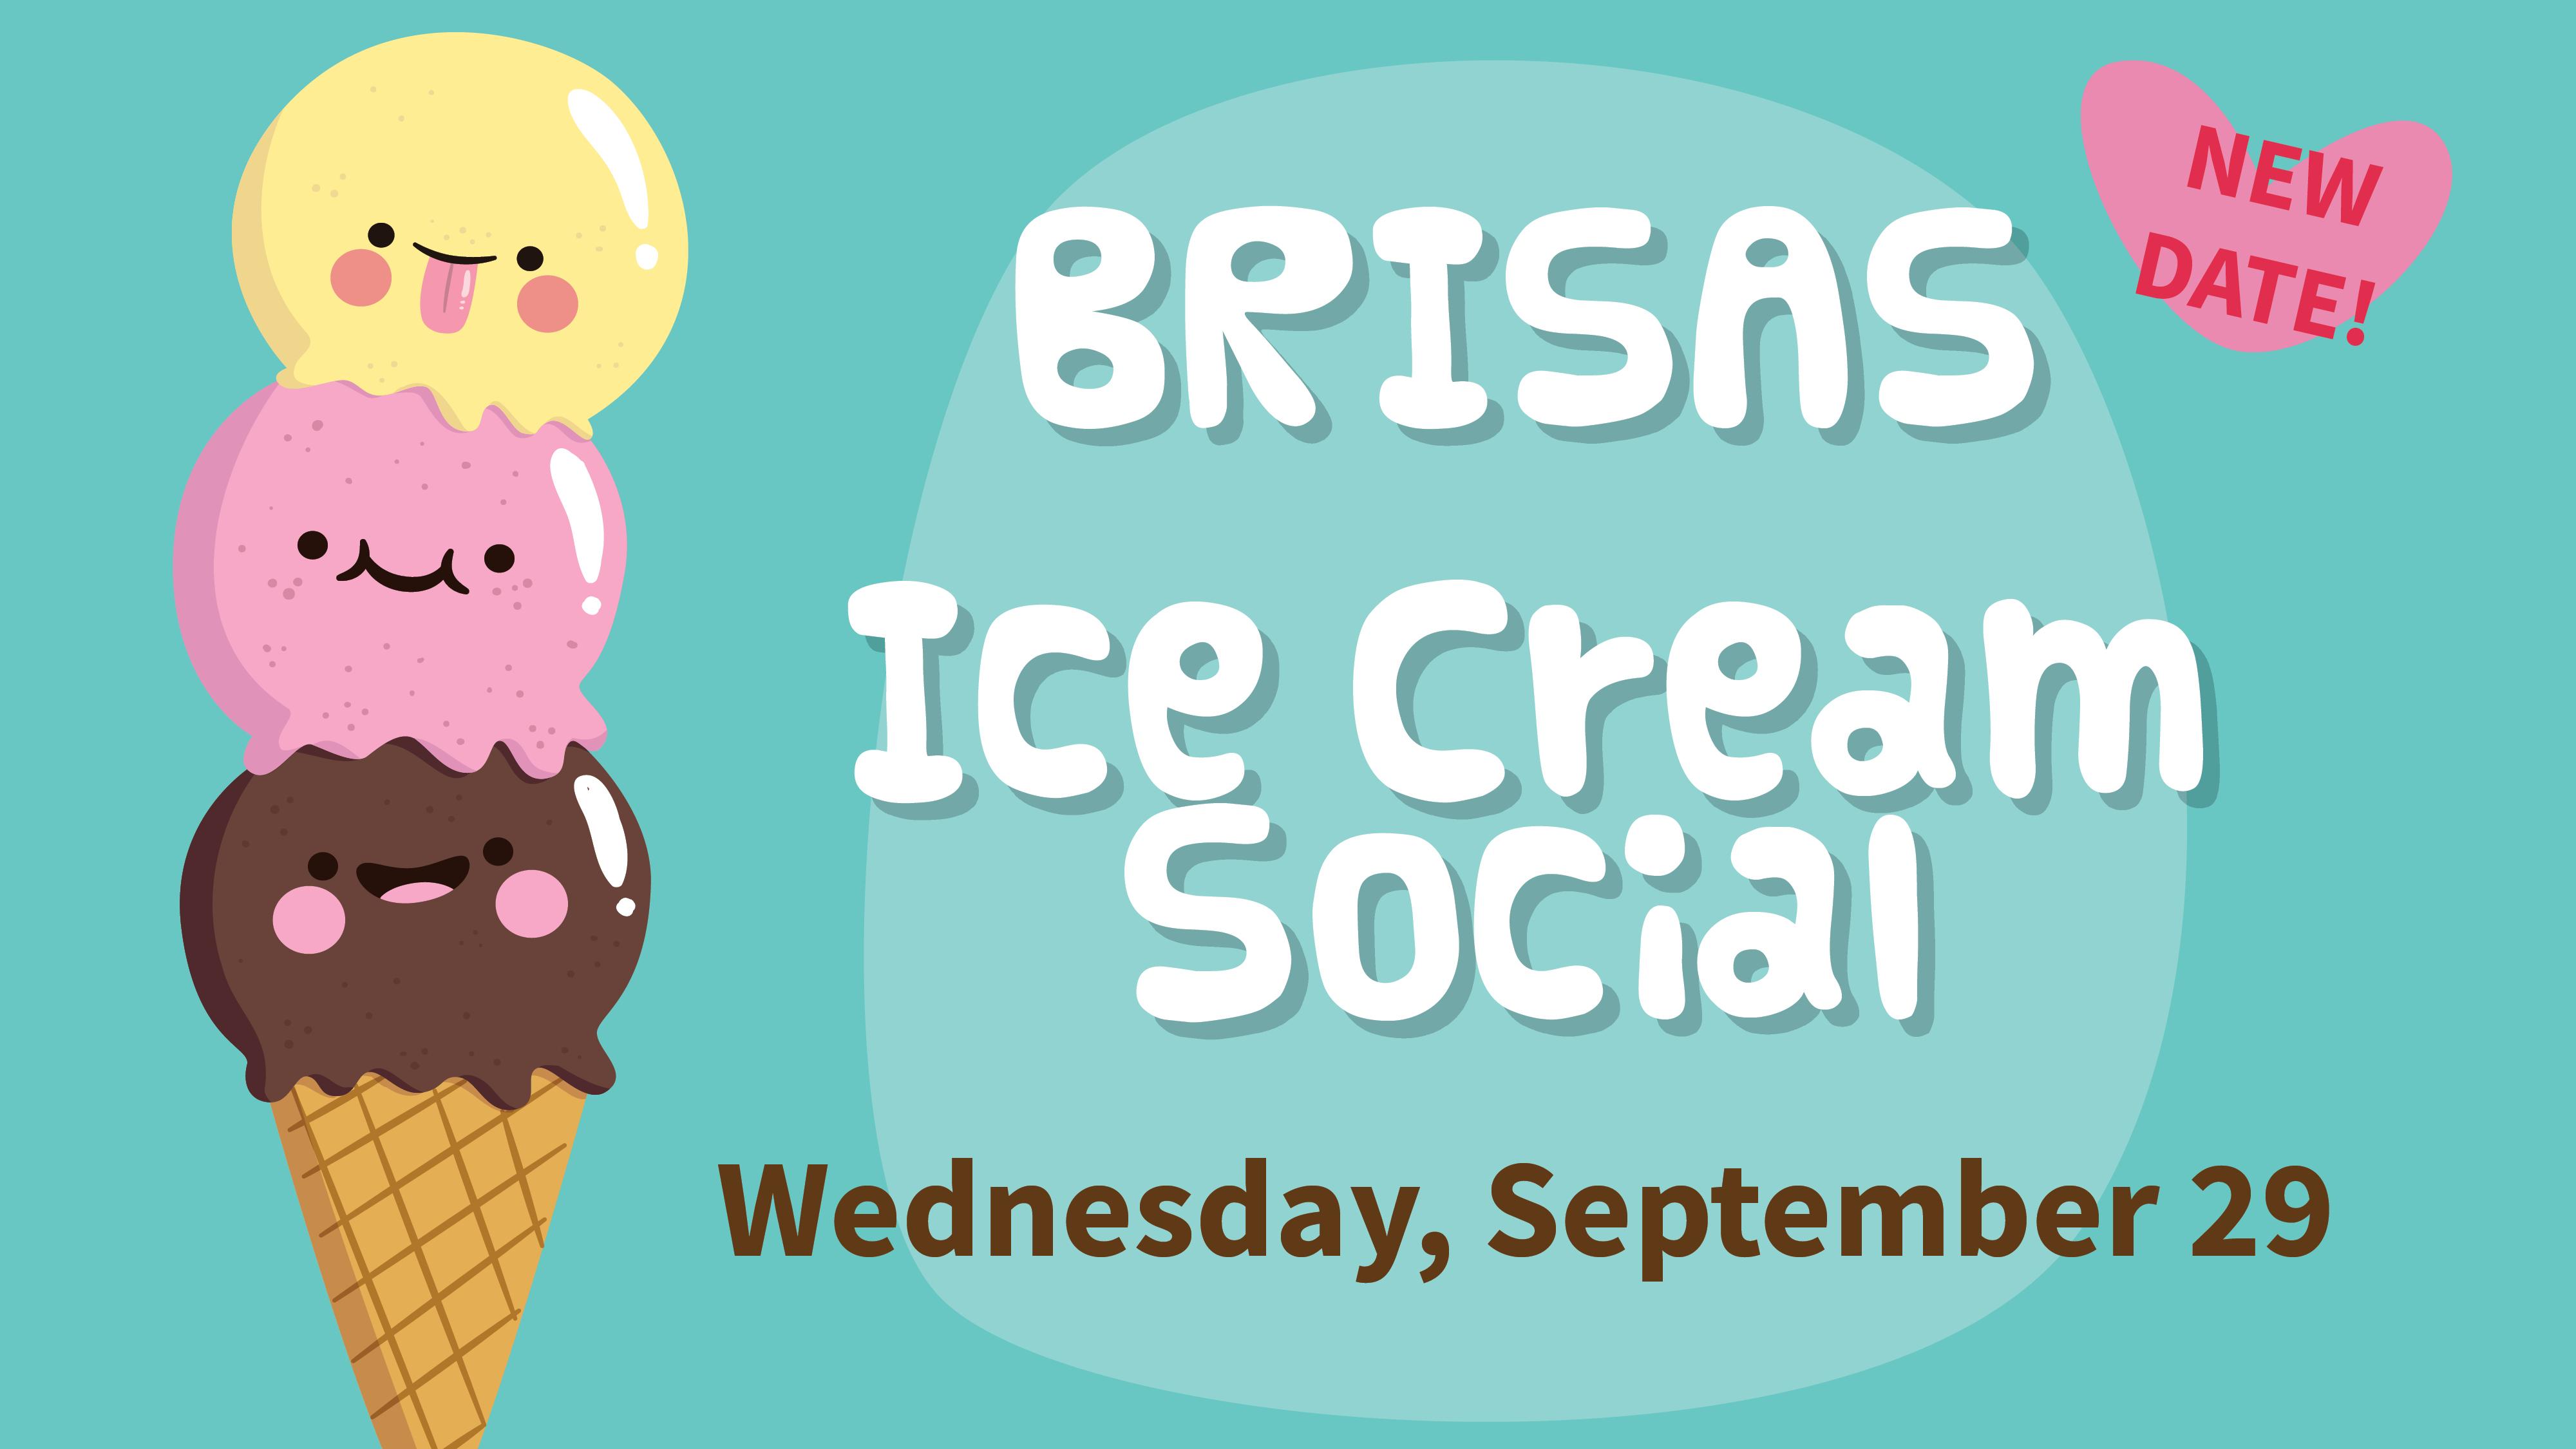 Ice Cream Social - NEW DATE!